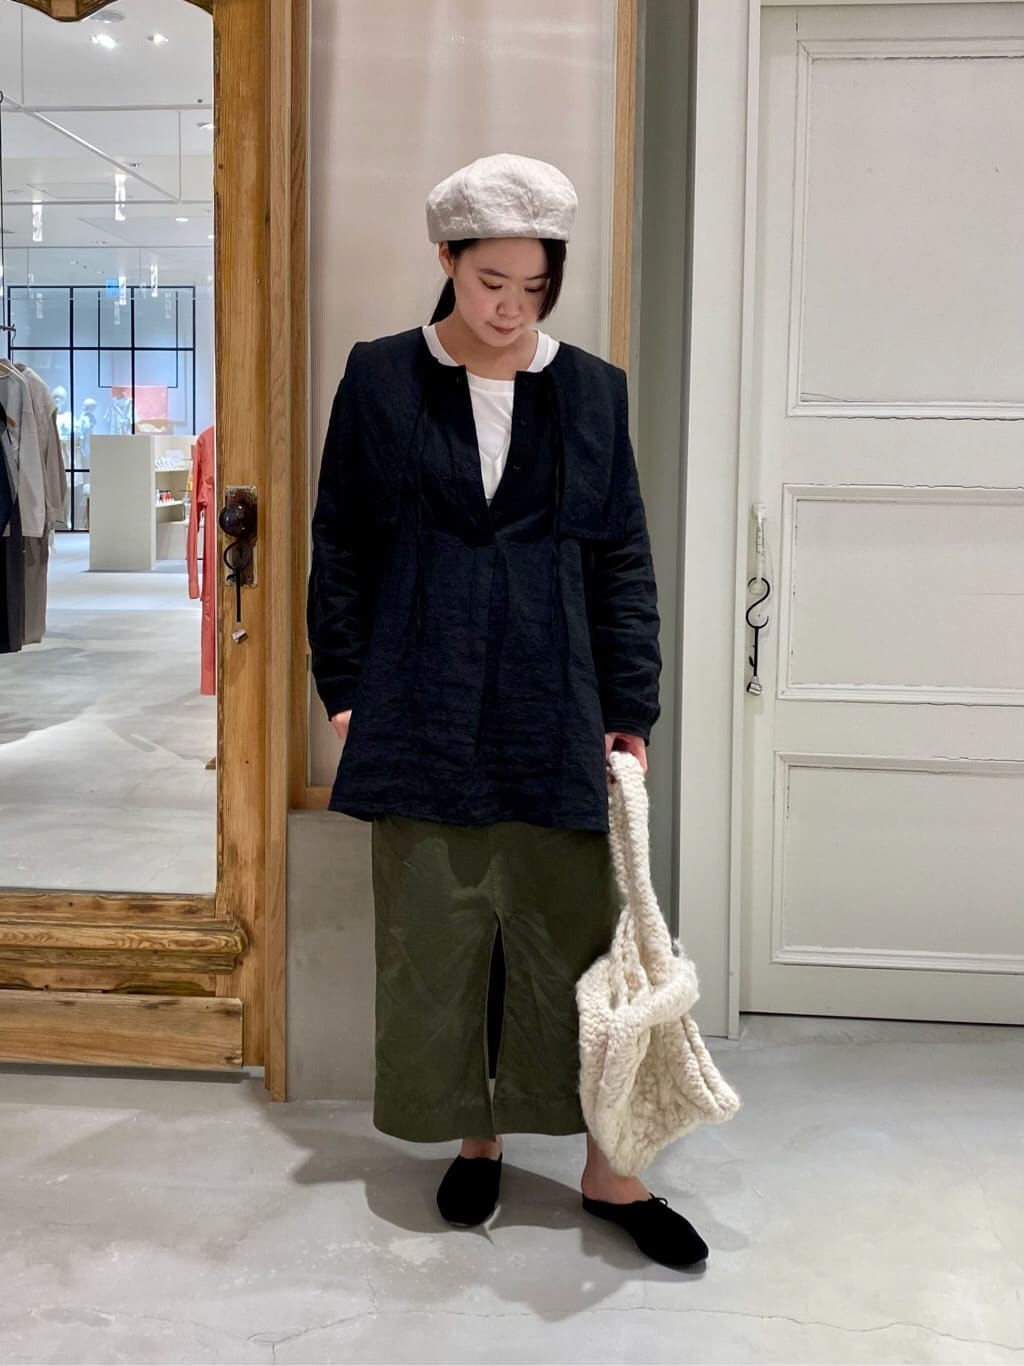 bulle de savon 渋谷スクランブルスクエア 身長:158cm 2021.09.14